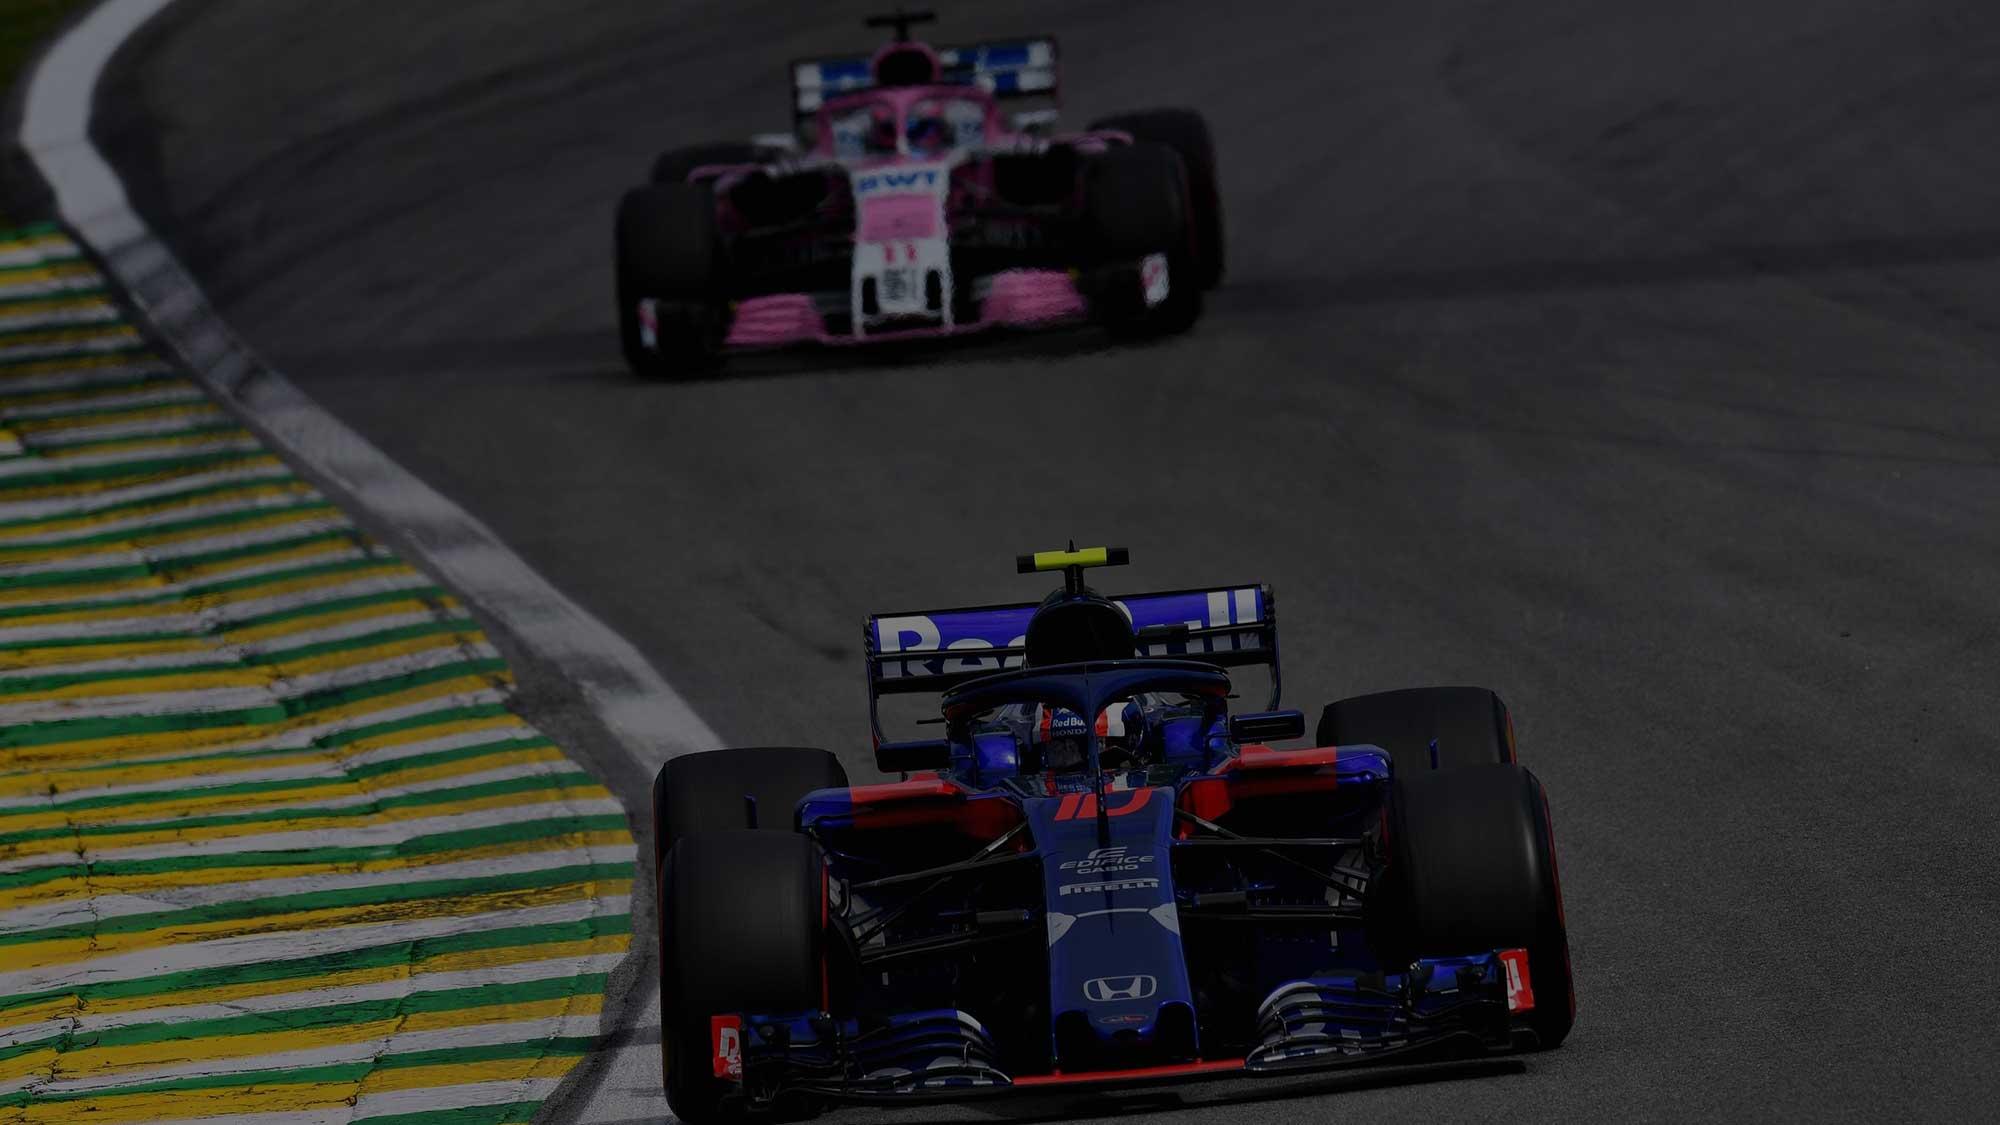 Formula 1 Brazilian Grand Prix Packages